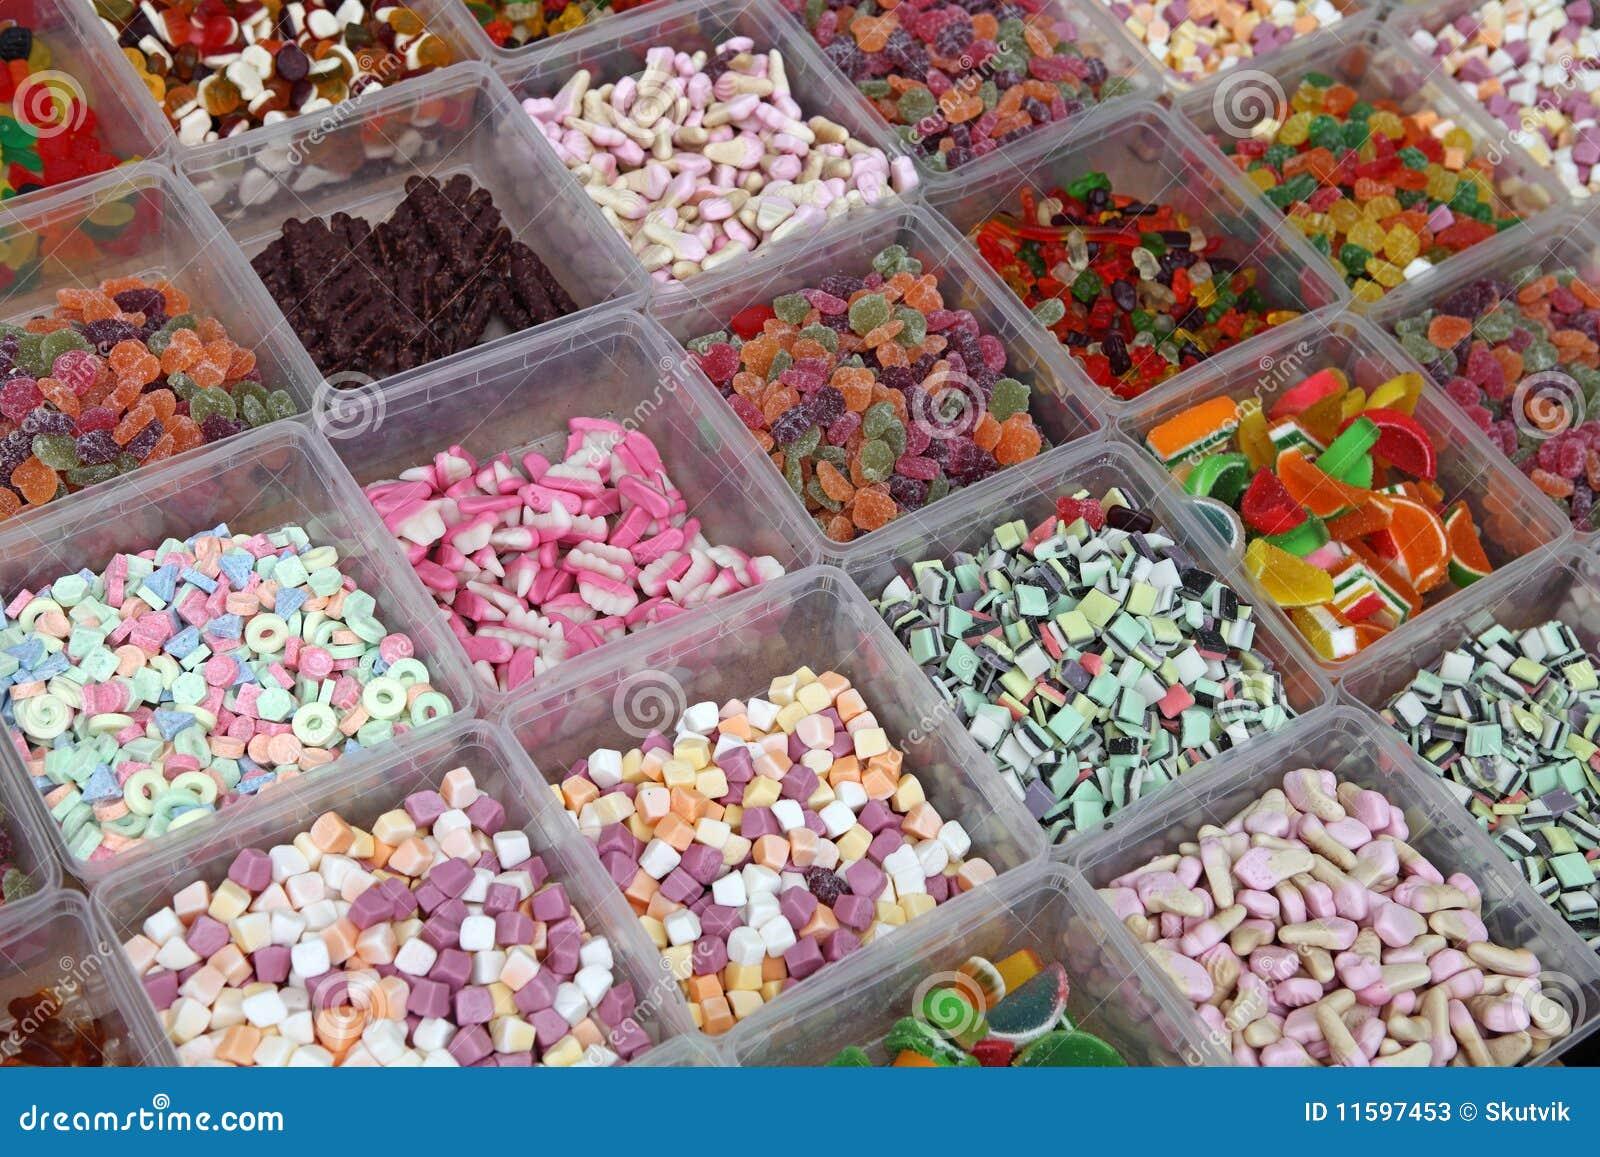 Fotografie stock: caramelle dolci nel negozio